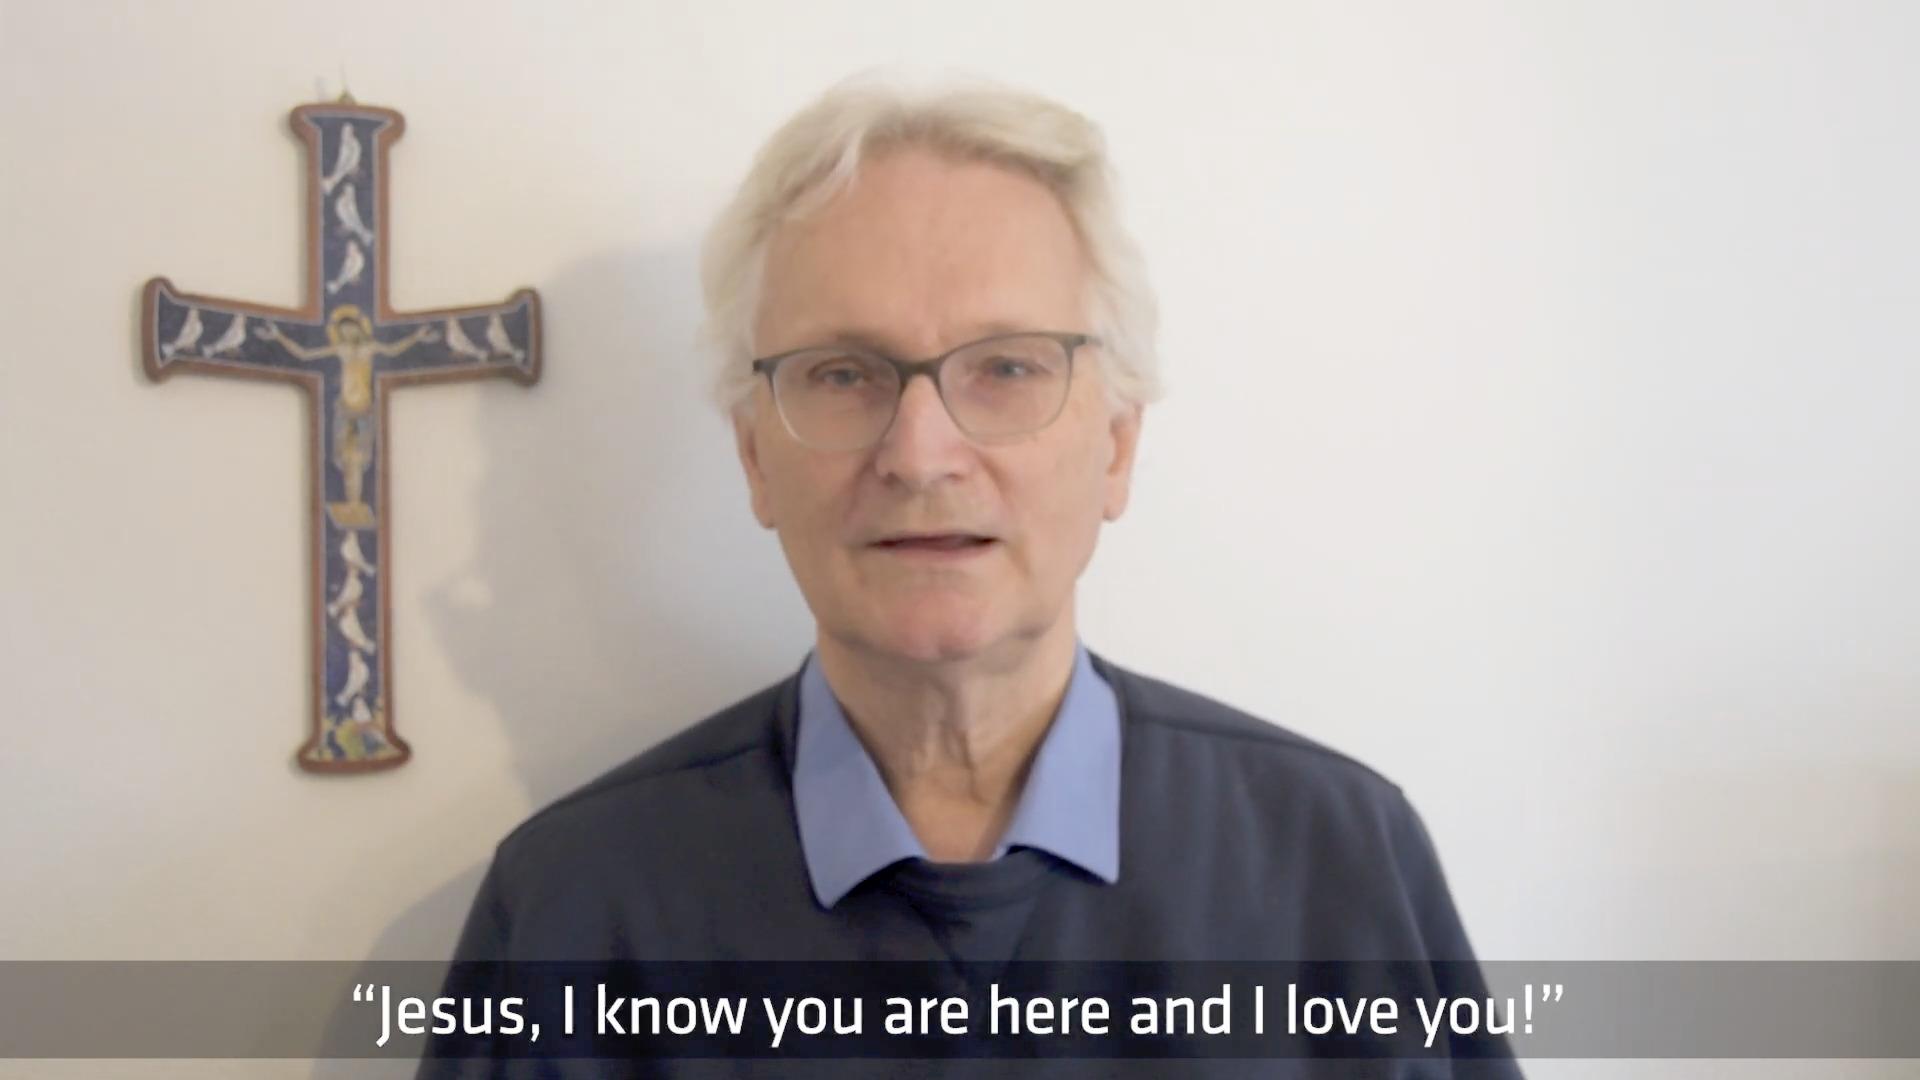 Jean-Luc Moens, capture @ IEC / YouTube